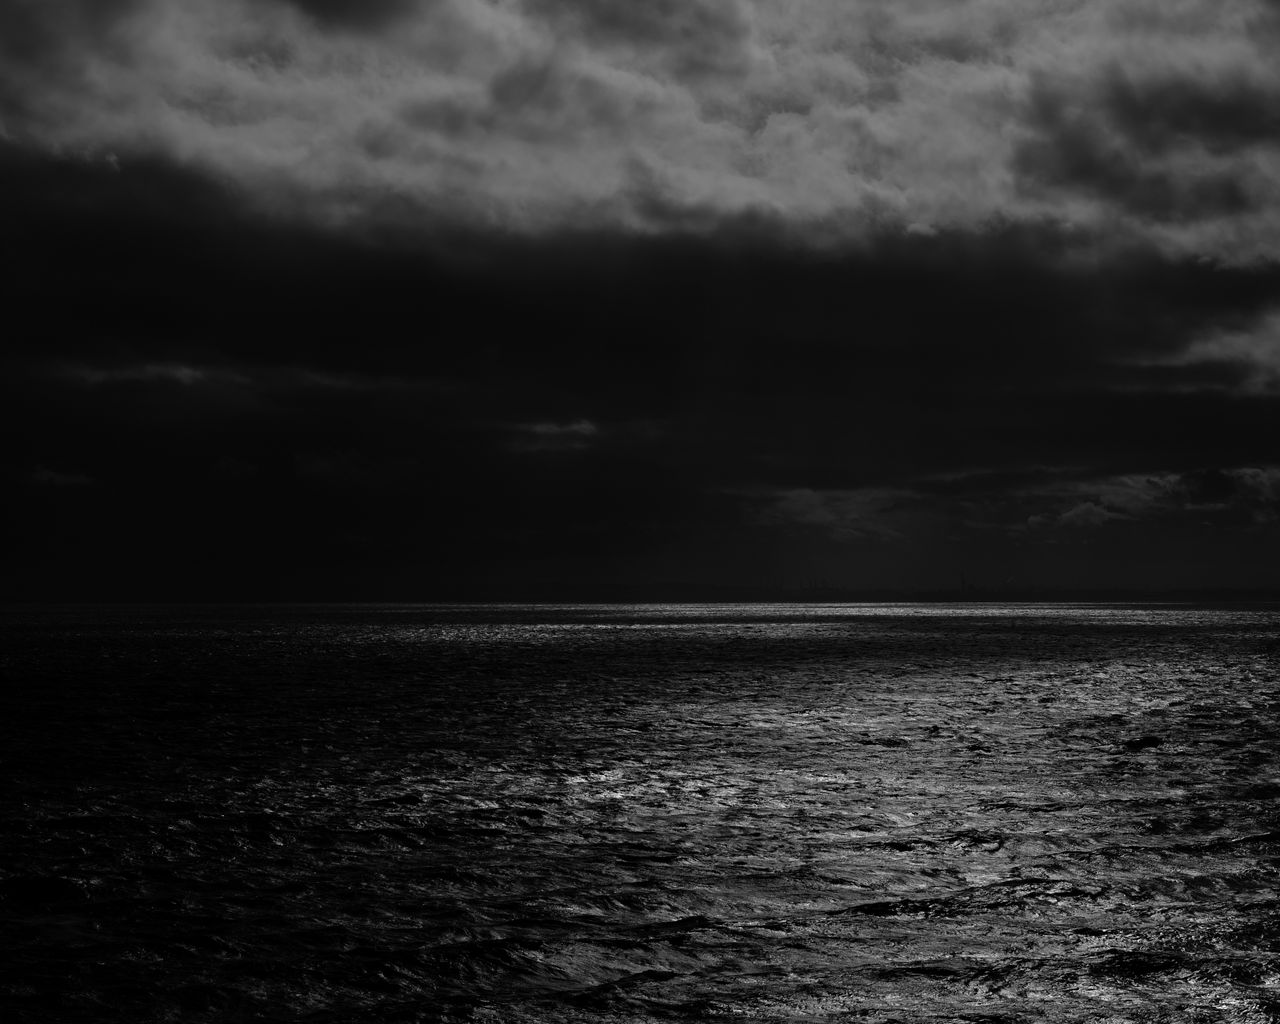 1280x1024 Wallpaper sea, horizon, bw, overcast, clouds, ripples